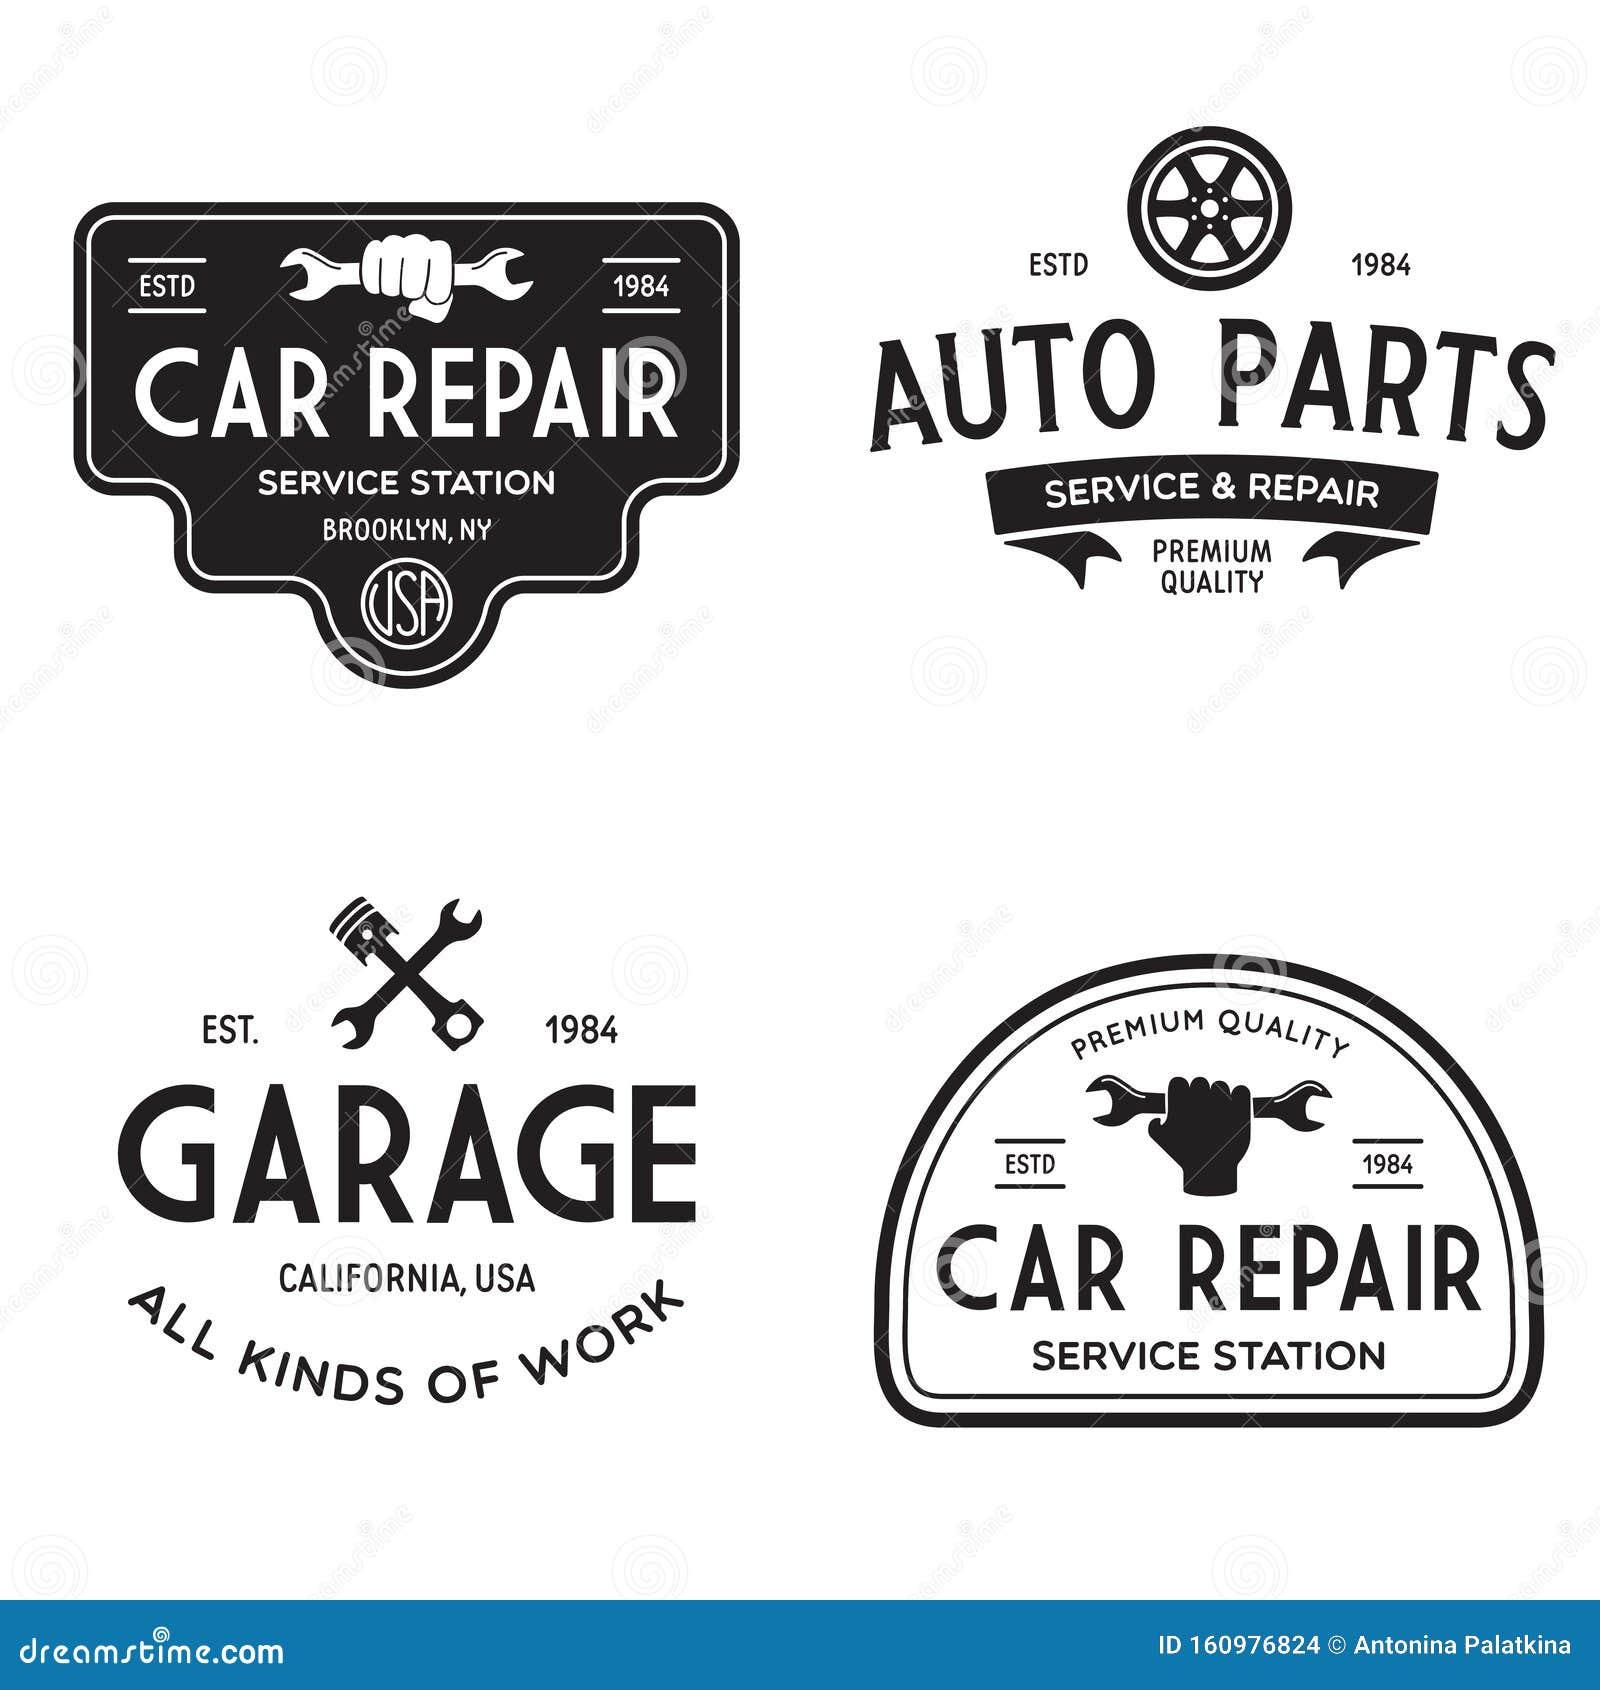 Set Of Vintage Monochrome Car Repair Service Templates Of